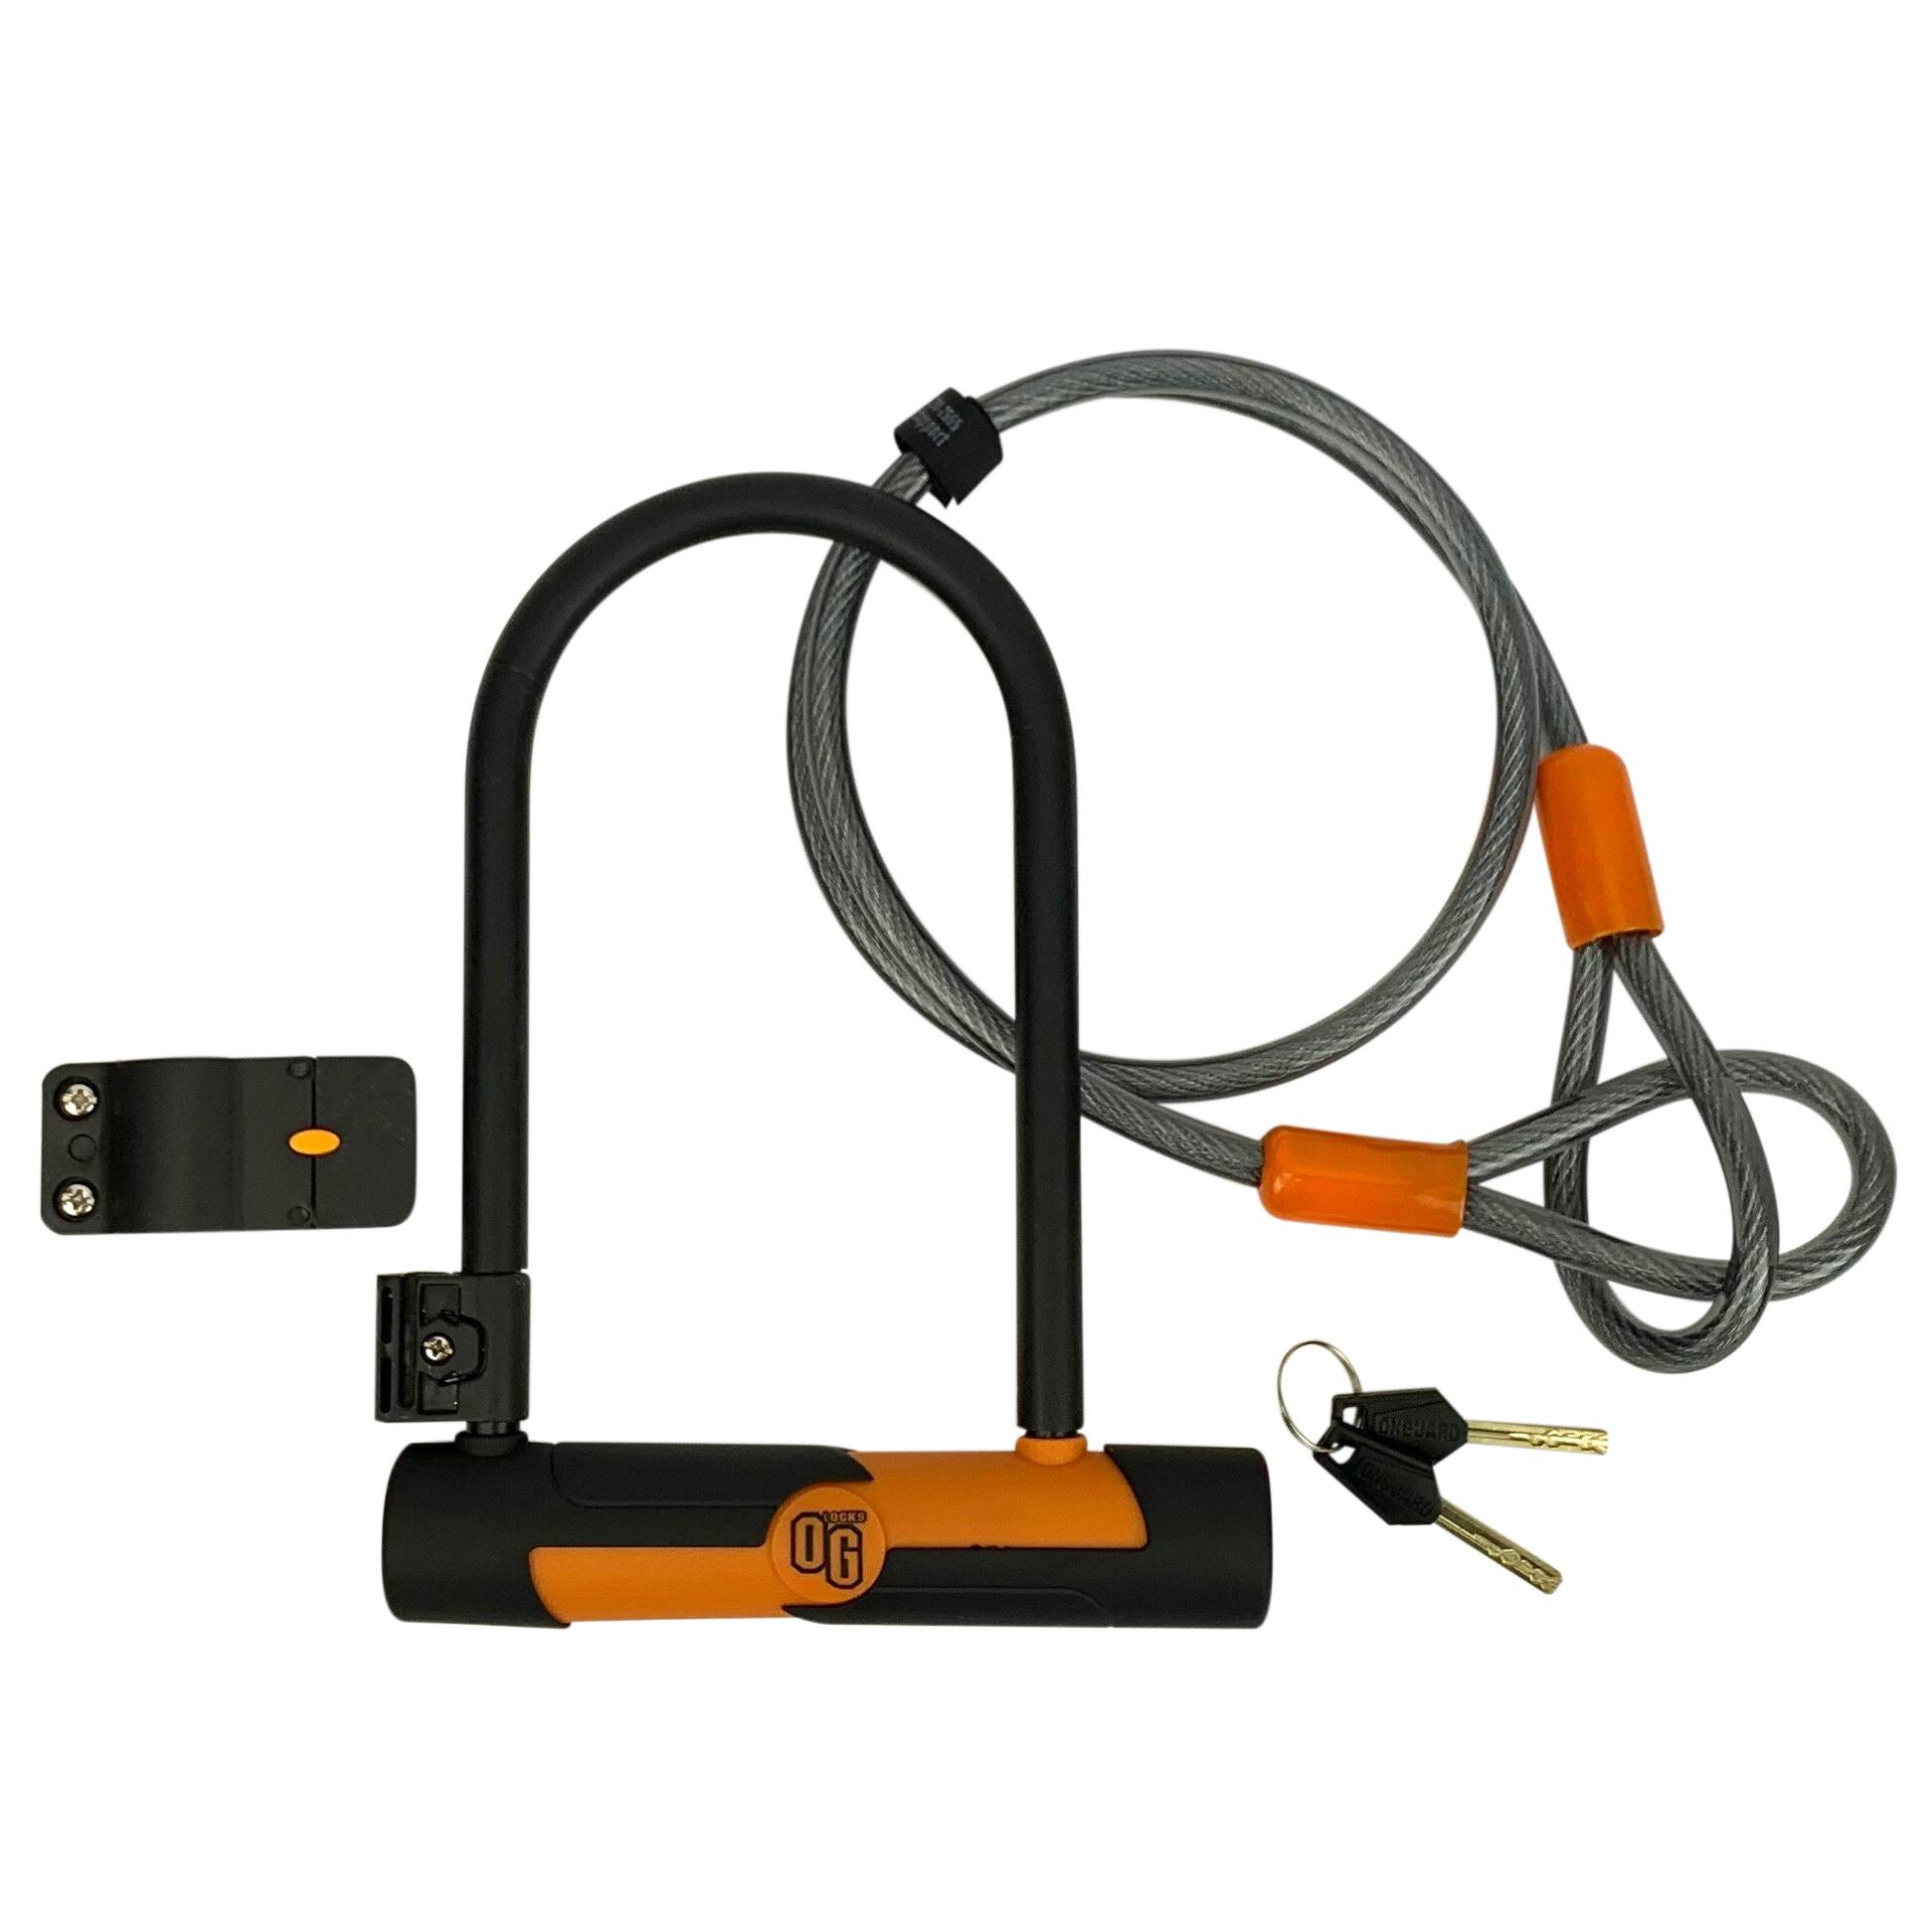 OnGuard Double Team Bike U-Lock and 4' Cable